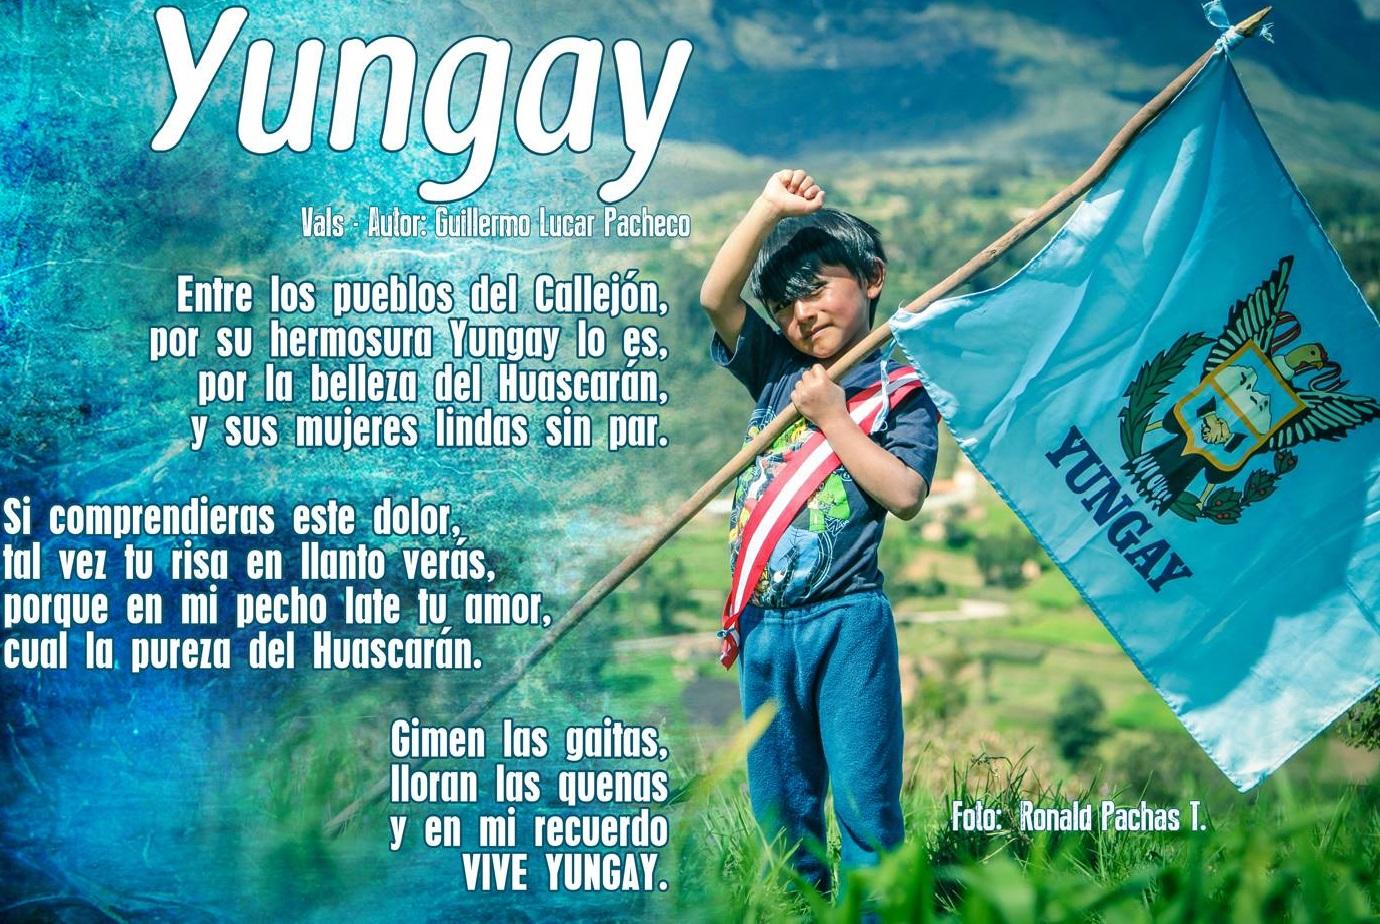 M_Ronald Pachas_Niñ Yungay